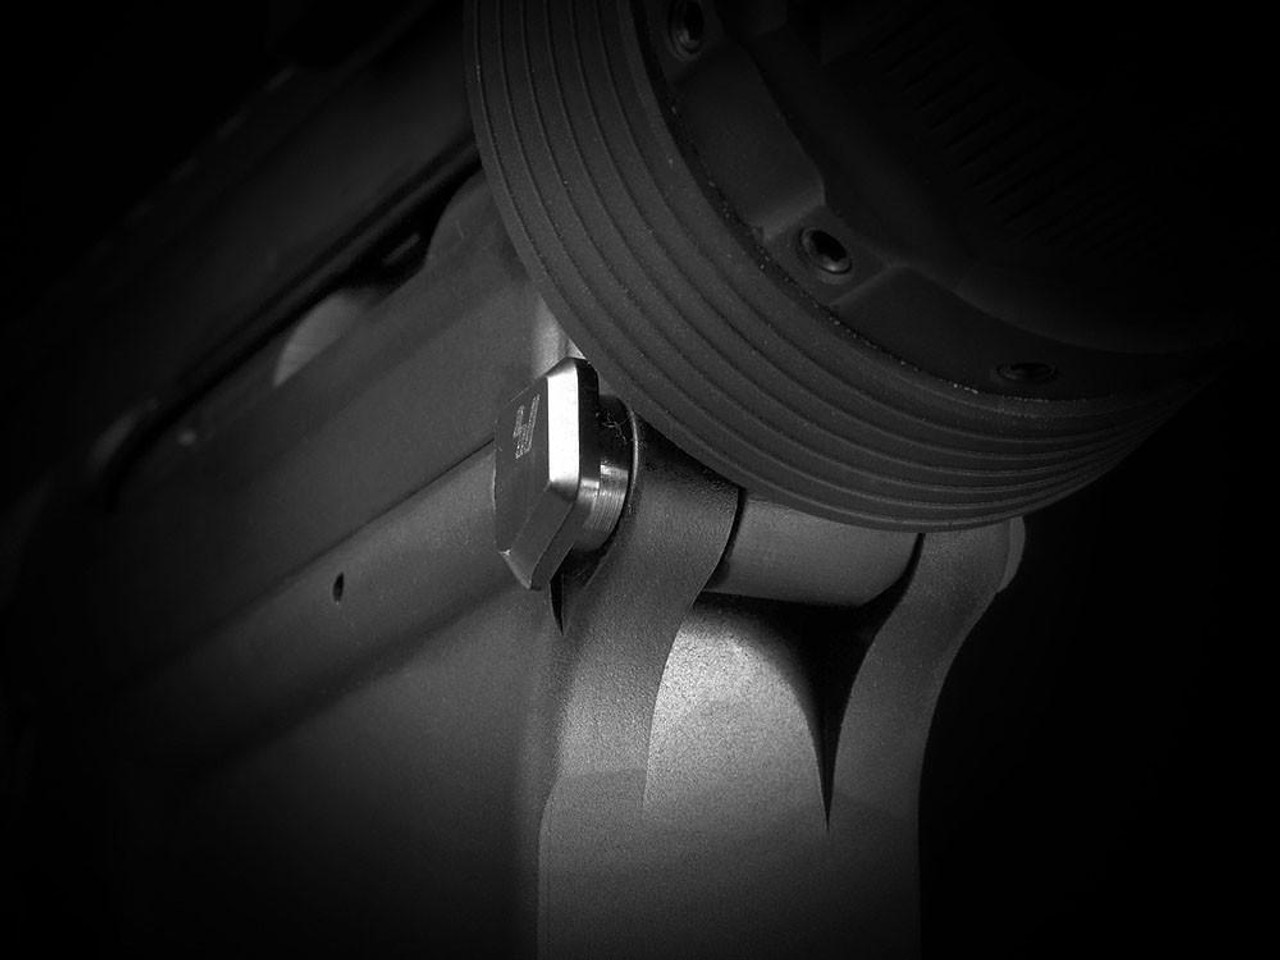 Strike Industries Extended Pivot / Takedown Pins